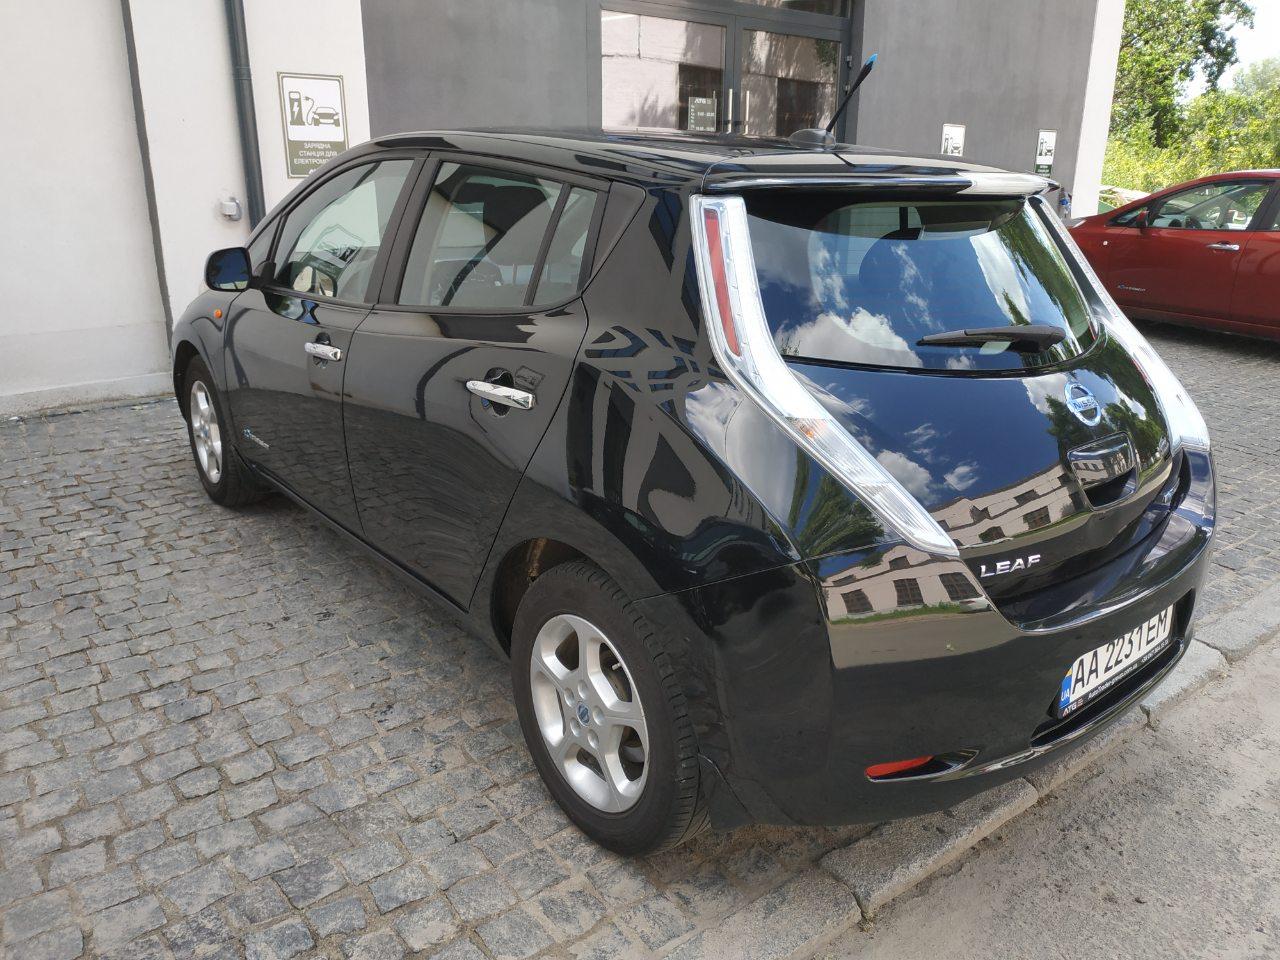 http://autocredit.com.ua/electro-cars/uploads/3/19-02-20/ziWL8M_MA0ZG75189.jpeg